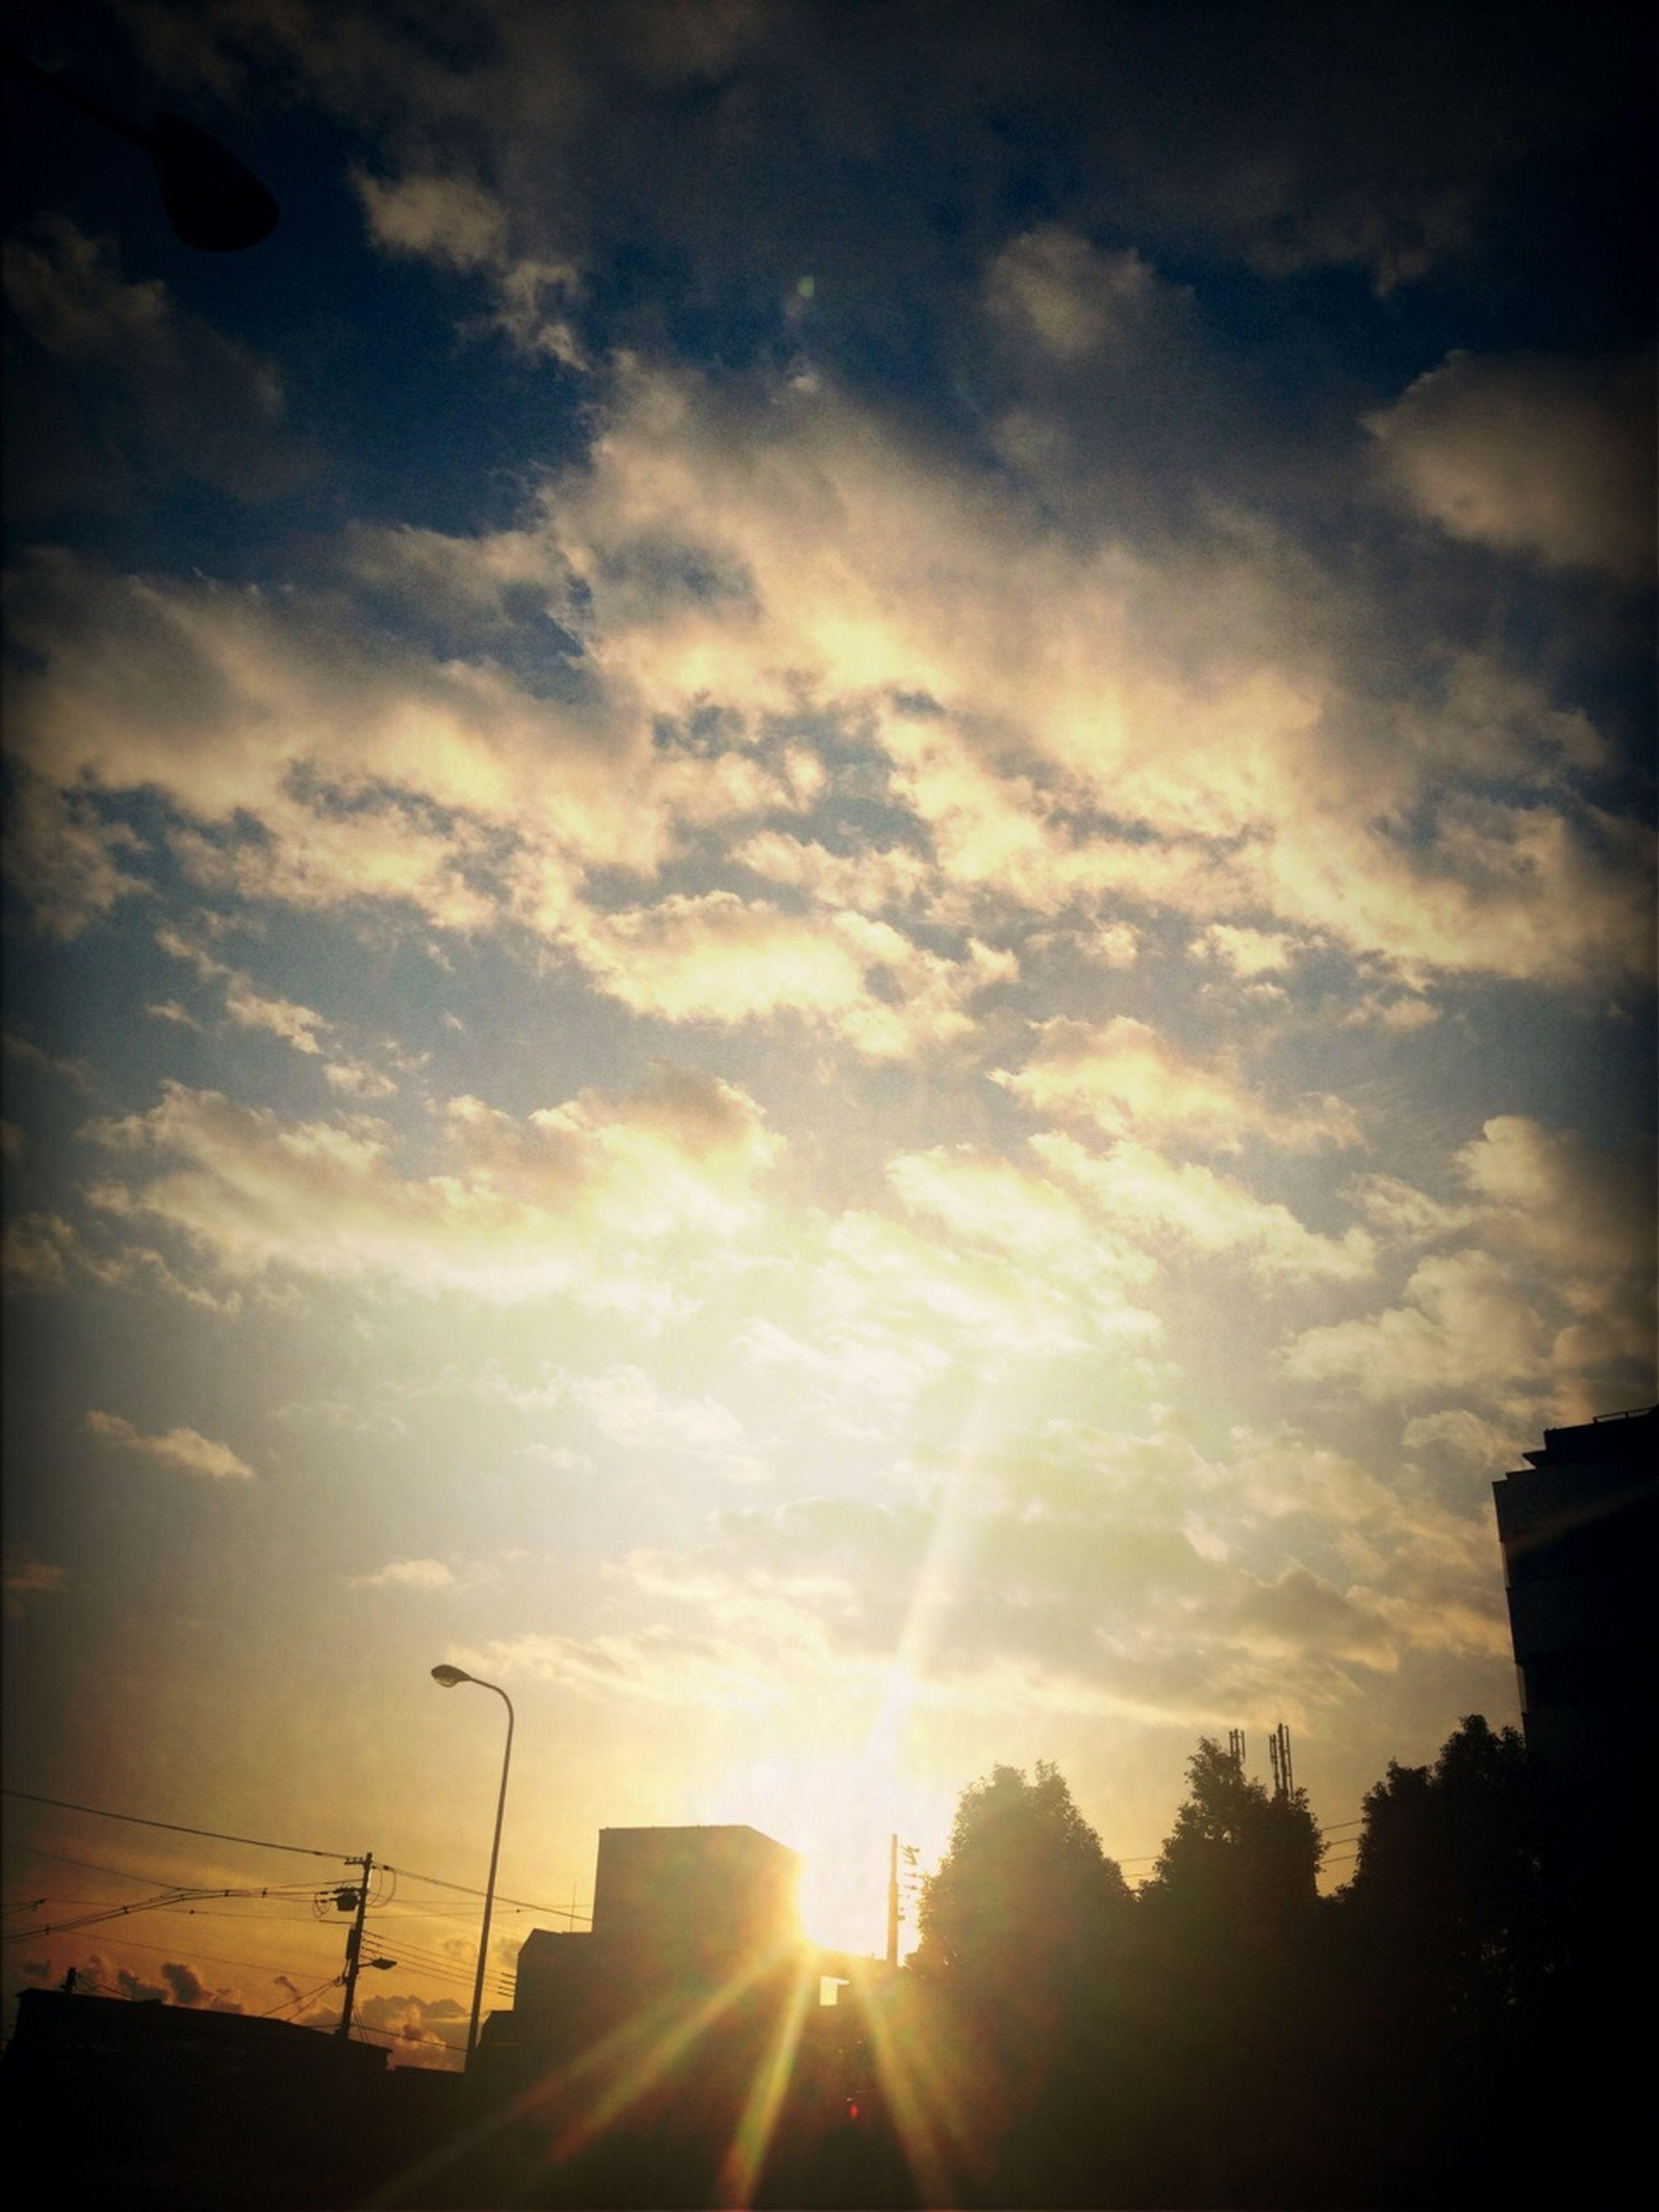 sun, sunset, sunbeam, sky, silhouette, sunlight, cloud - sky, lens flare, low angle view, built structure, architecture, building exterior, beauty in nature, nature, cloud, back lit, orange color, scenics, tree, outdoors